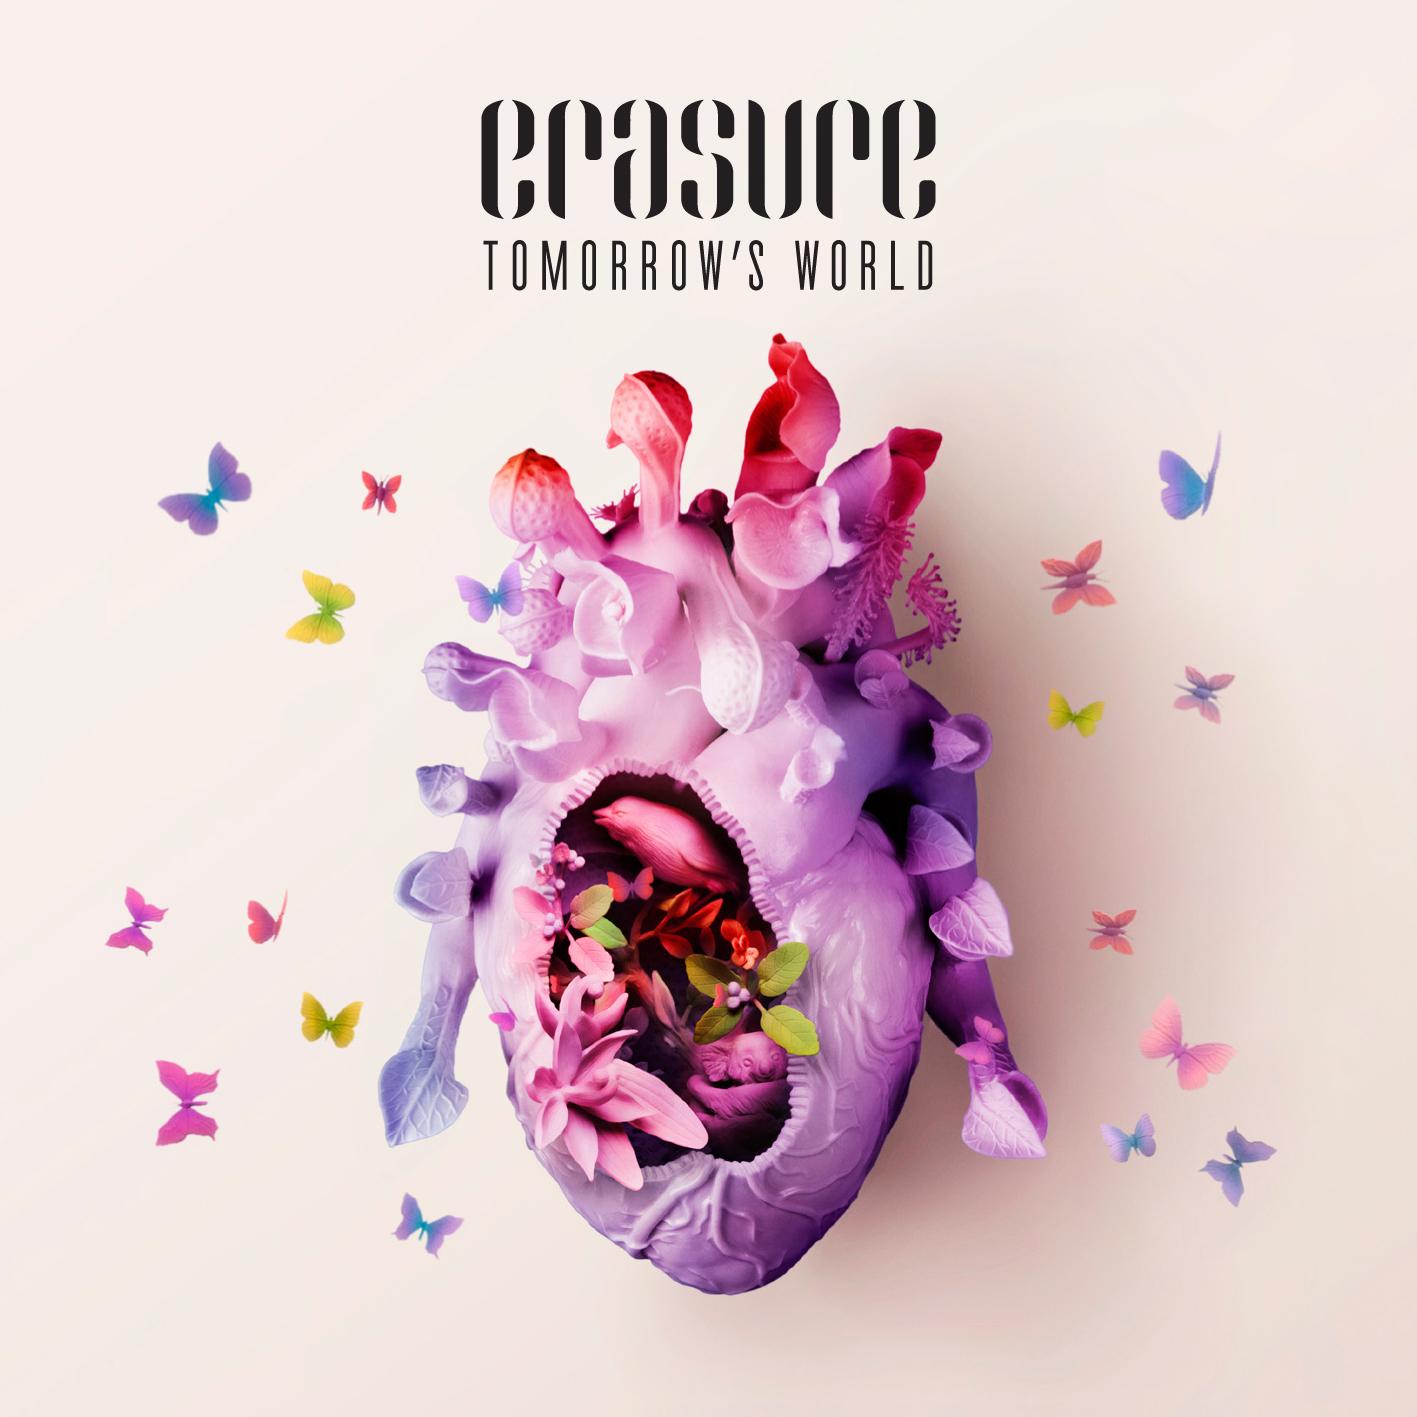 Erasure Tomorrow´s World (Erasure)